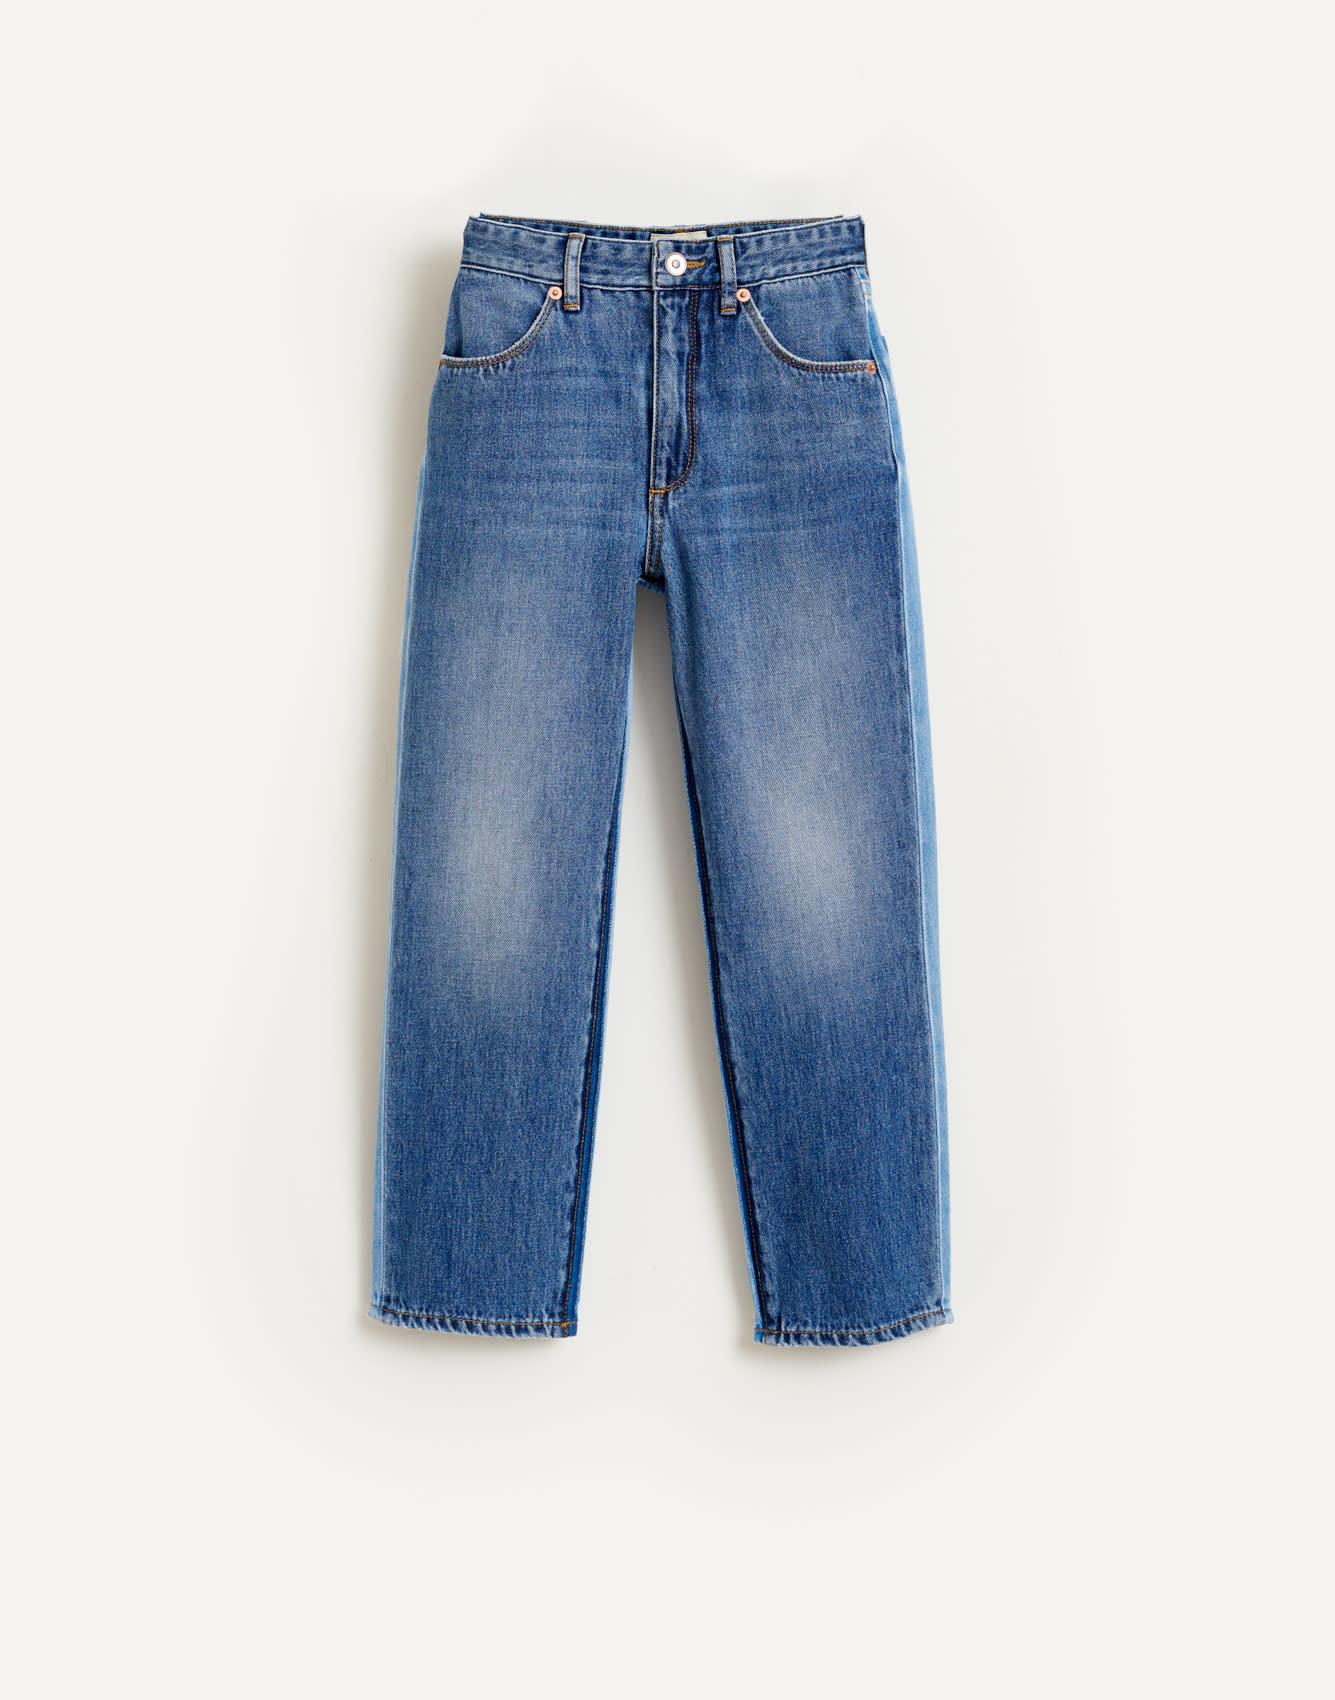 Pinata jeans grand daddy's-1